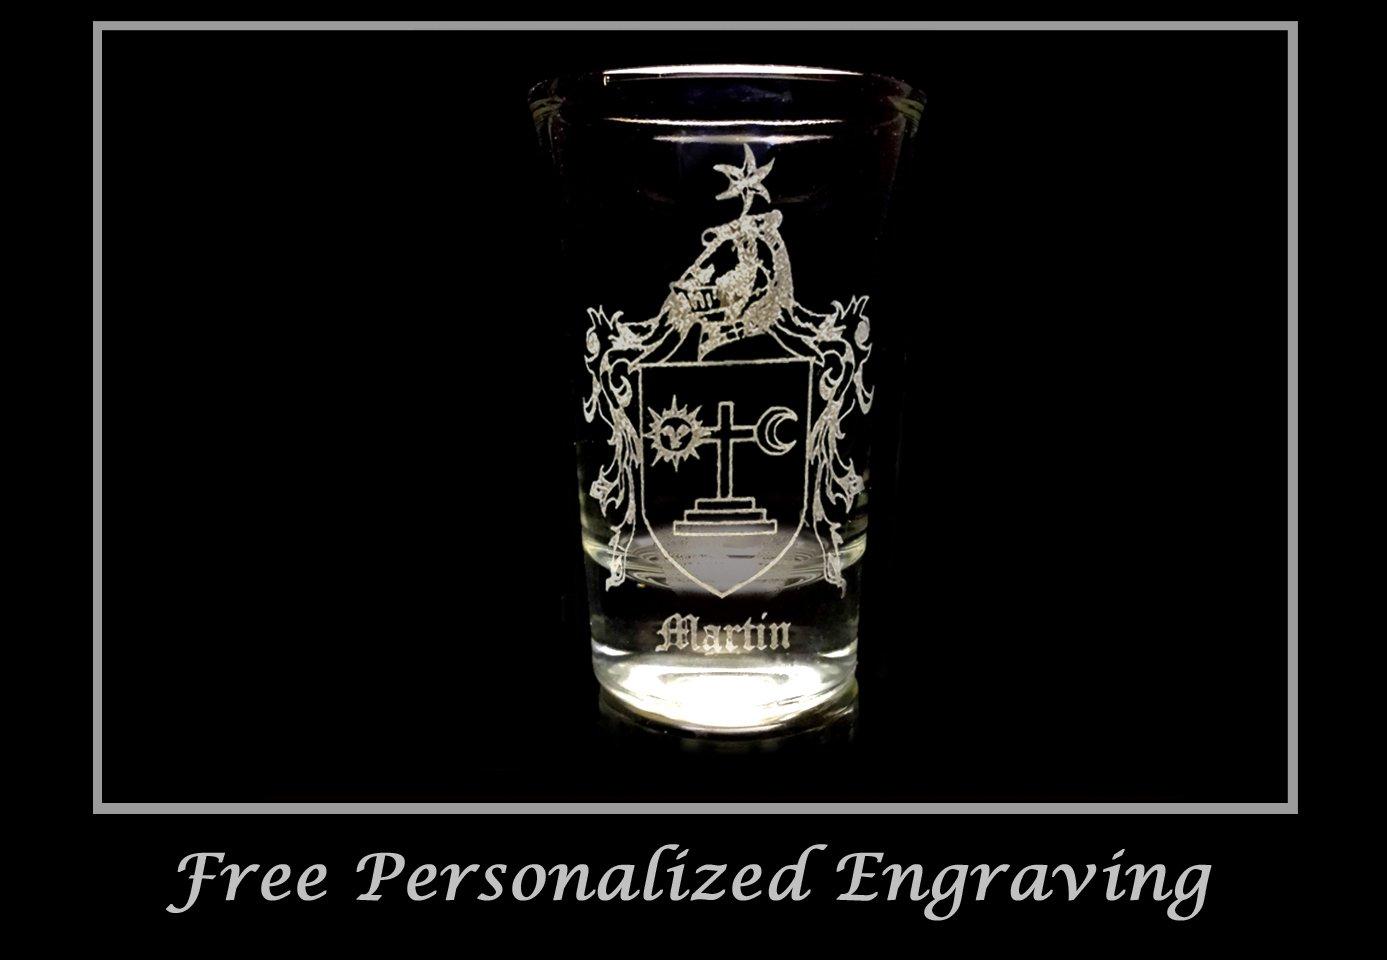 Free Personalized Engraving Irish Glass Celtic Decor Martin Irish Family Coat of Arms Shot Glass 2oz Set of 6